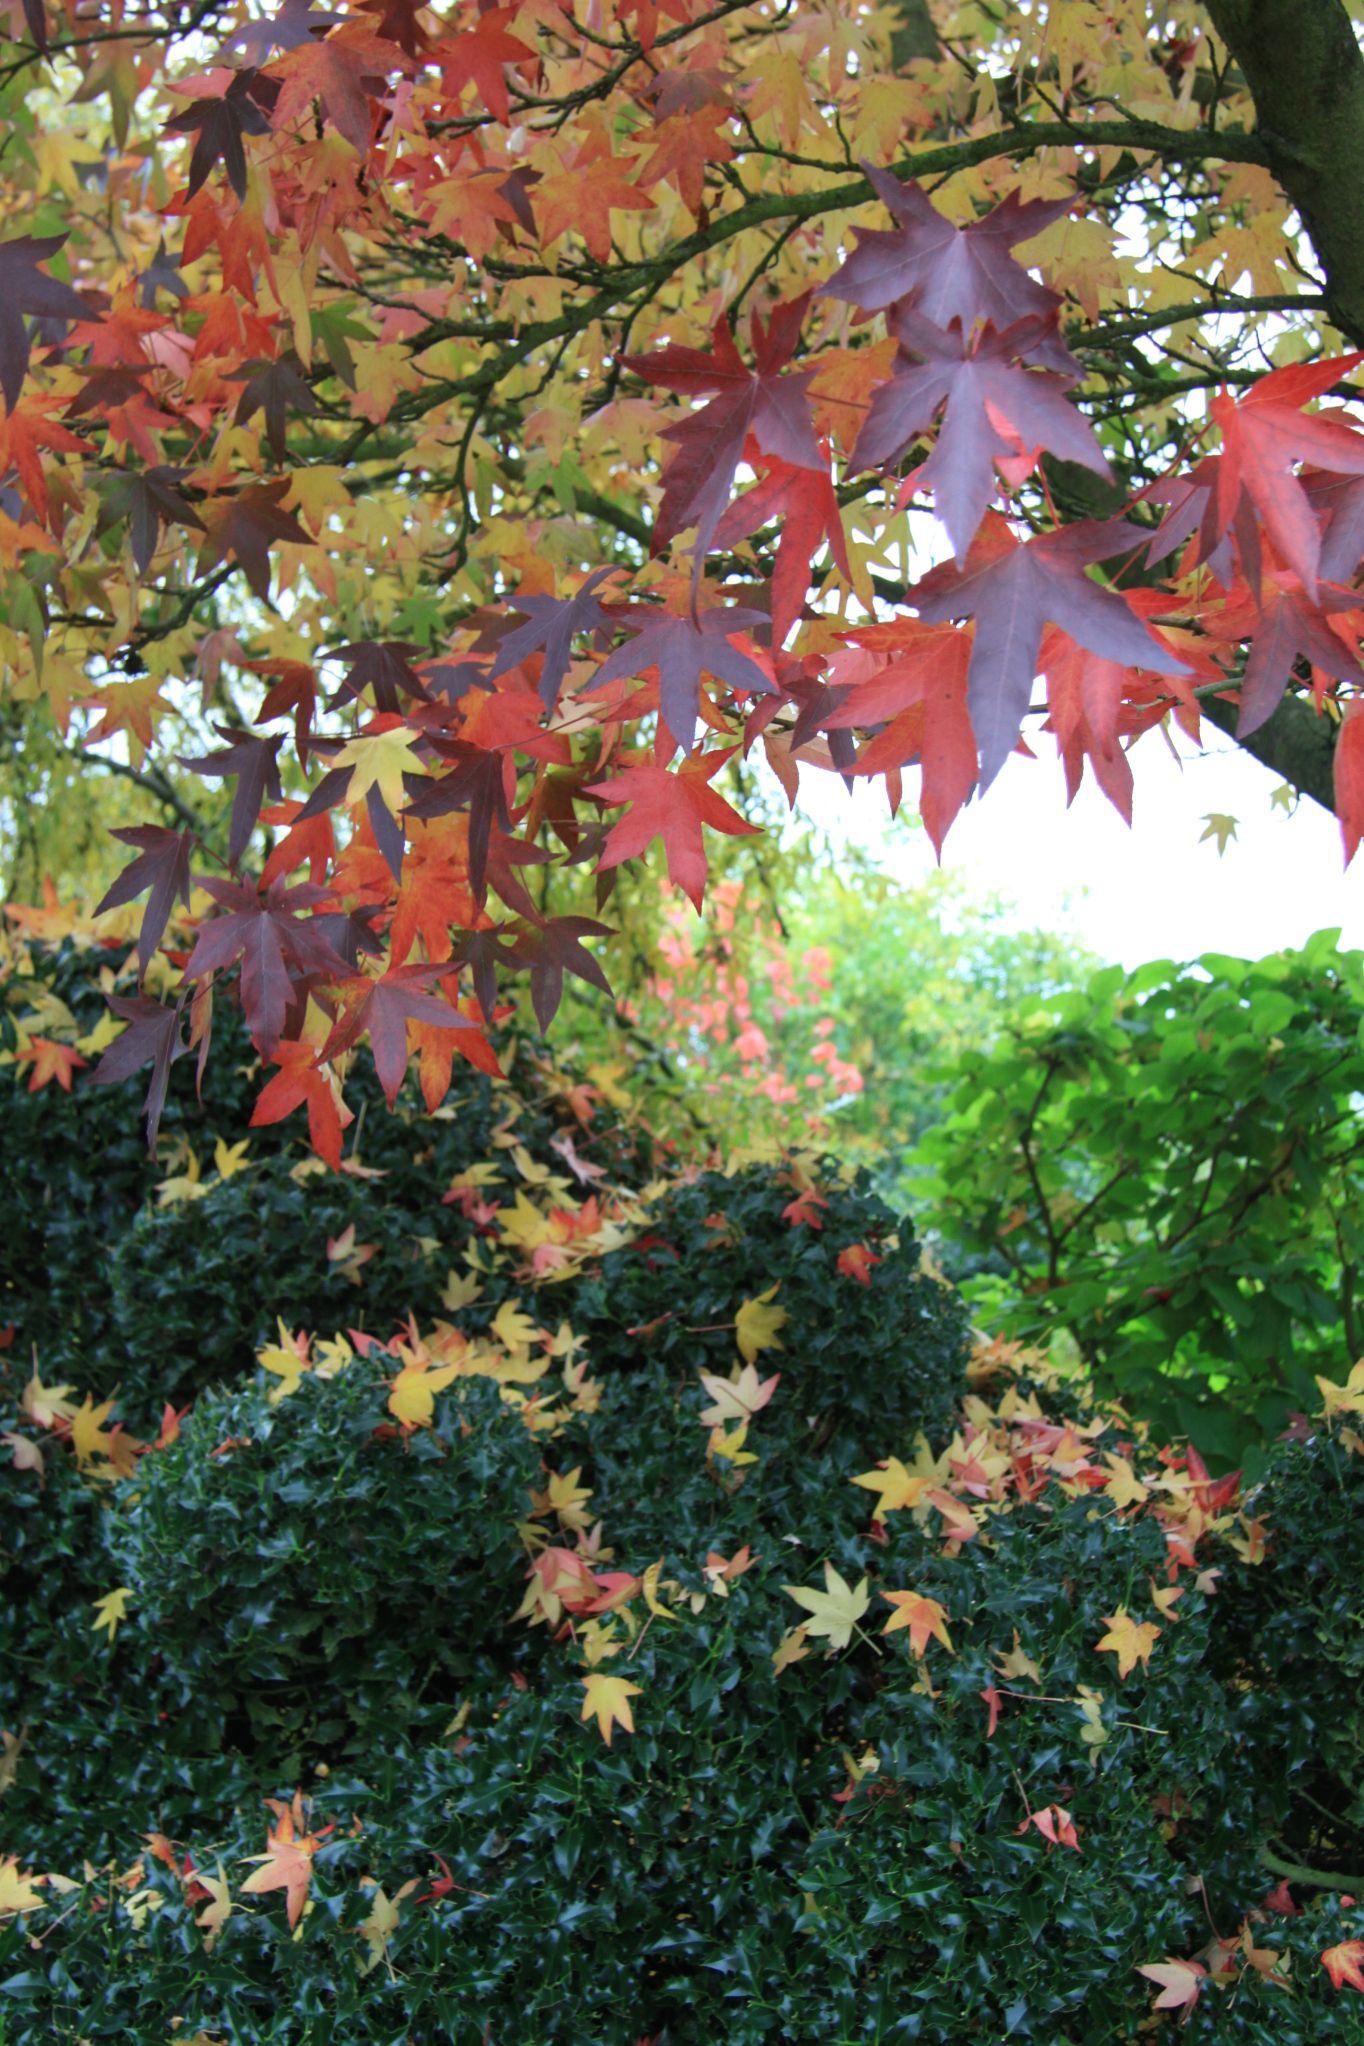 STARRY AUTUMN DAYS | Garden inspiration, Starry, Foliage